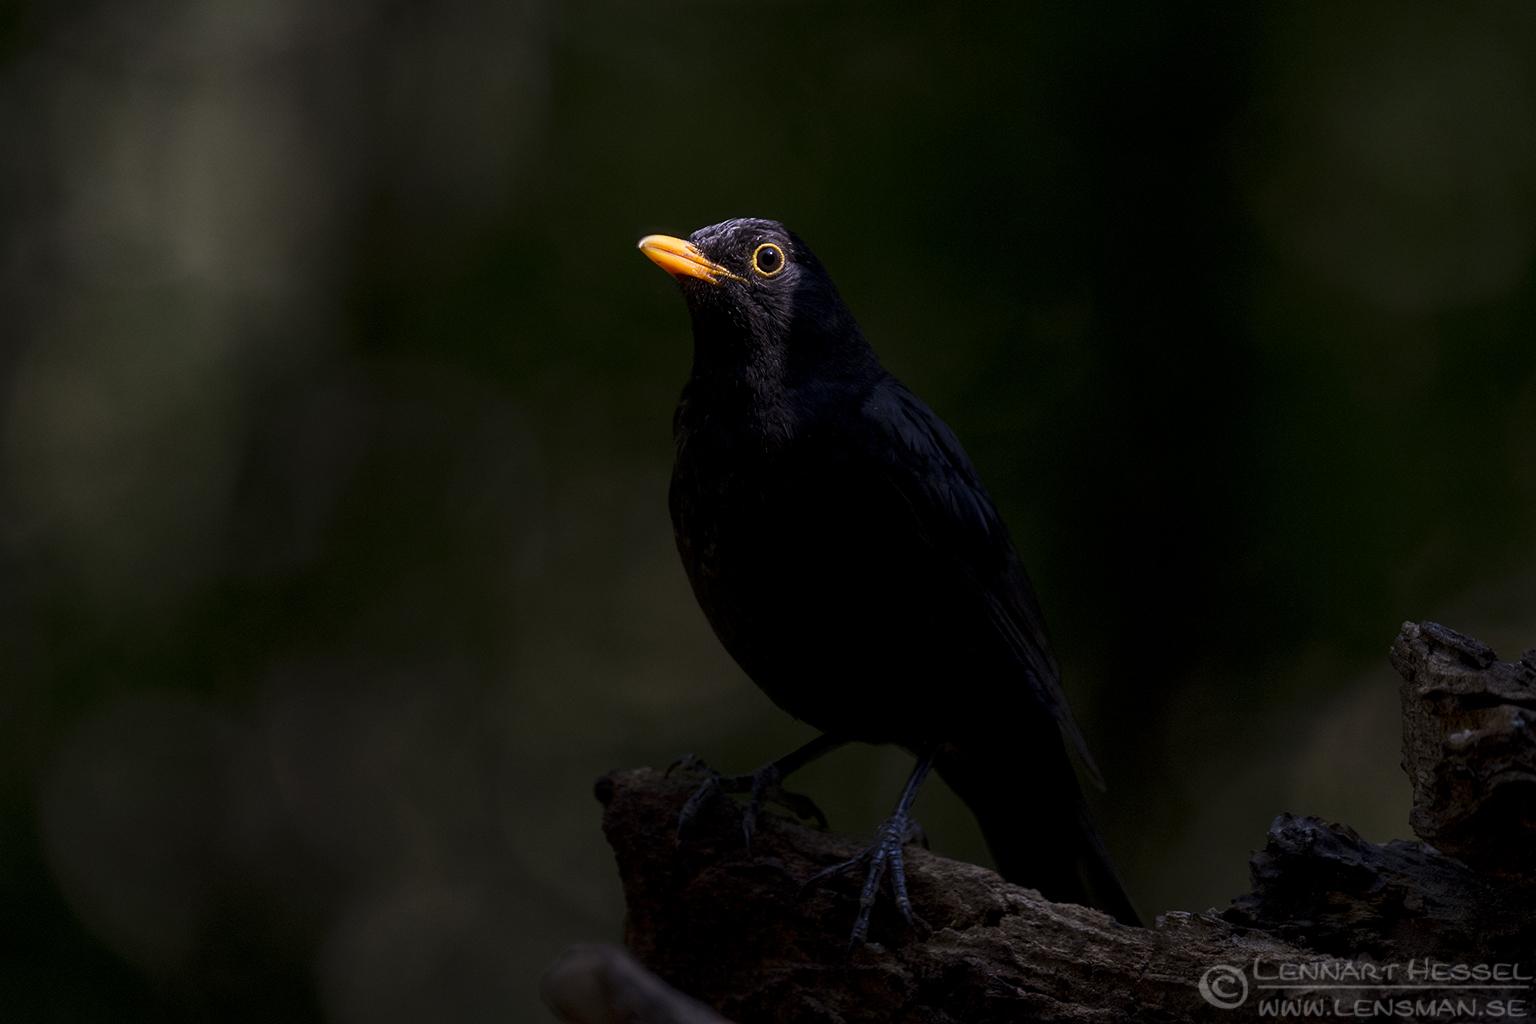 Common Blackbird bee-eater